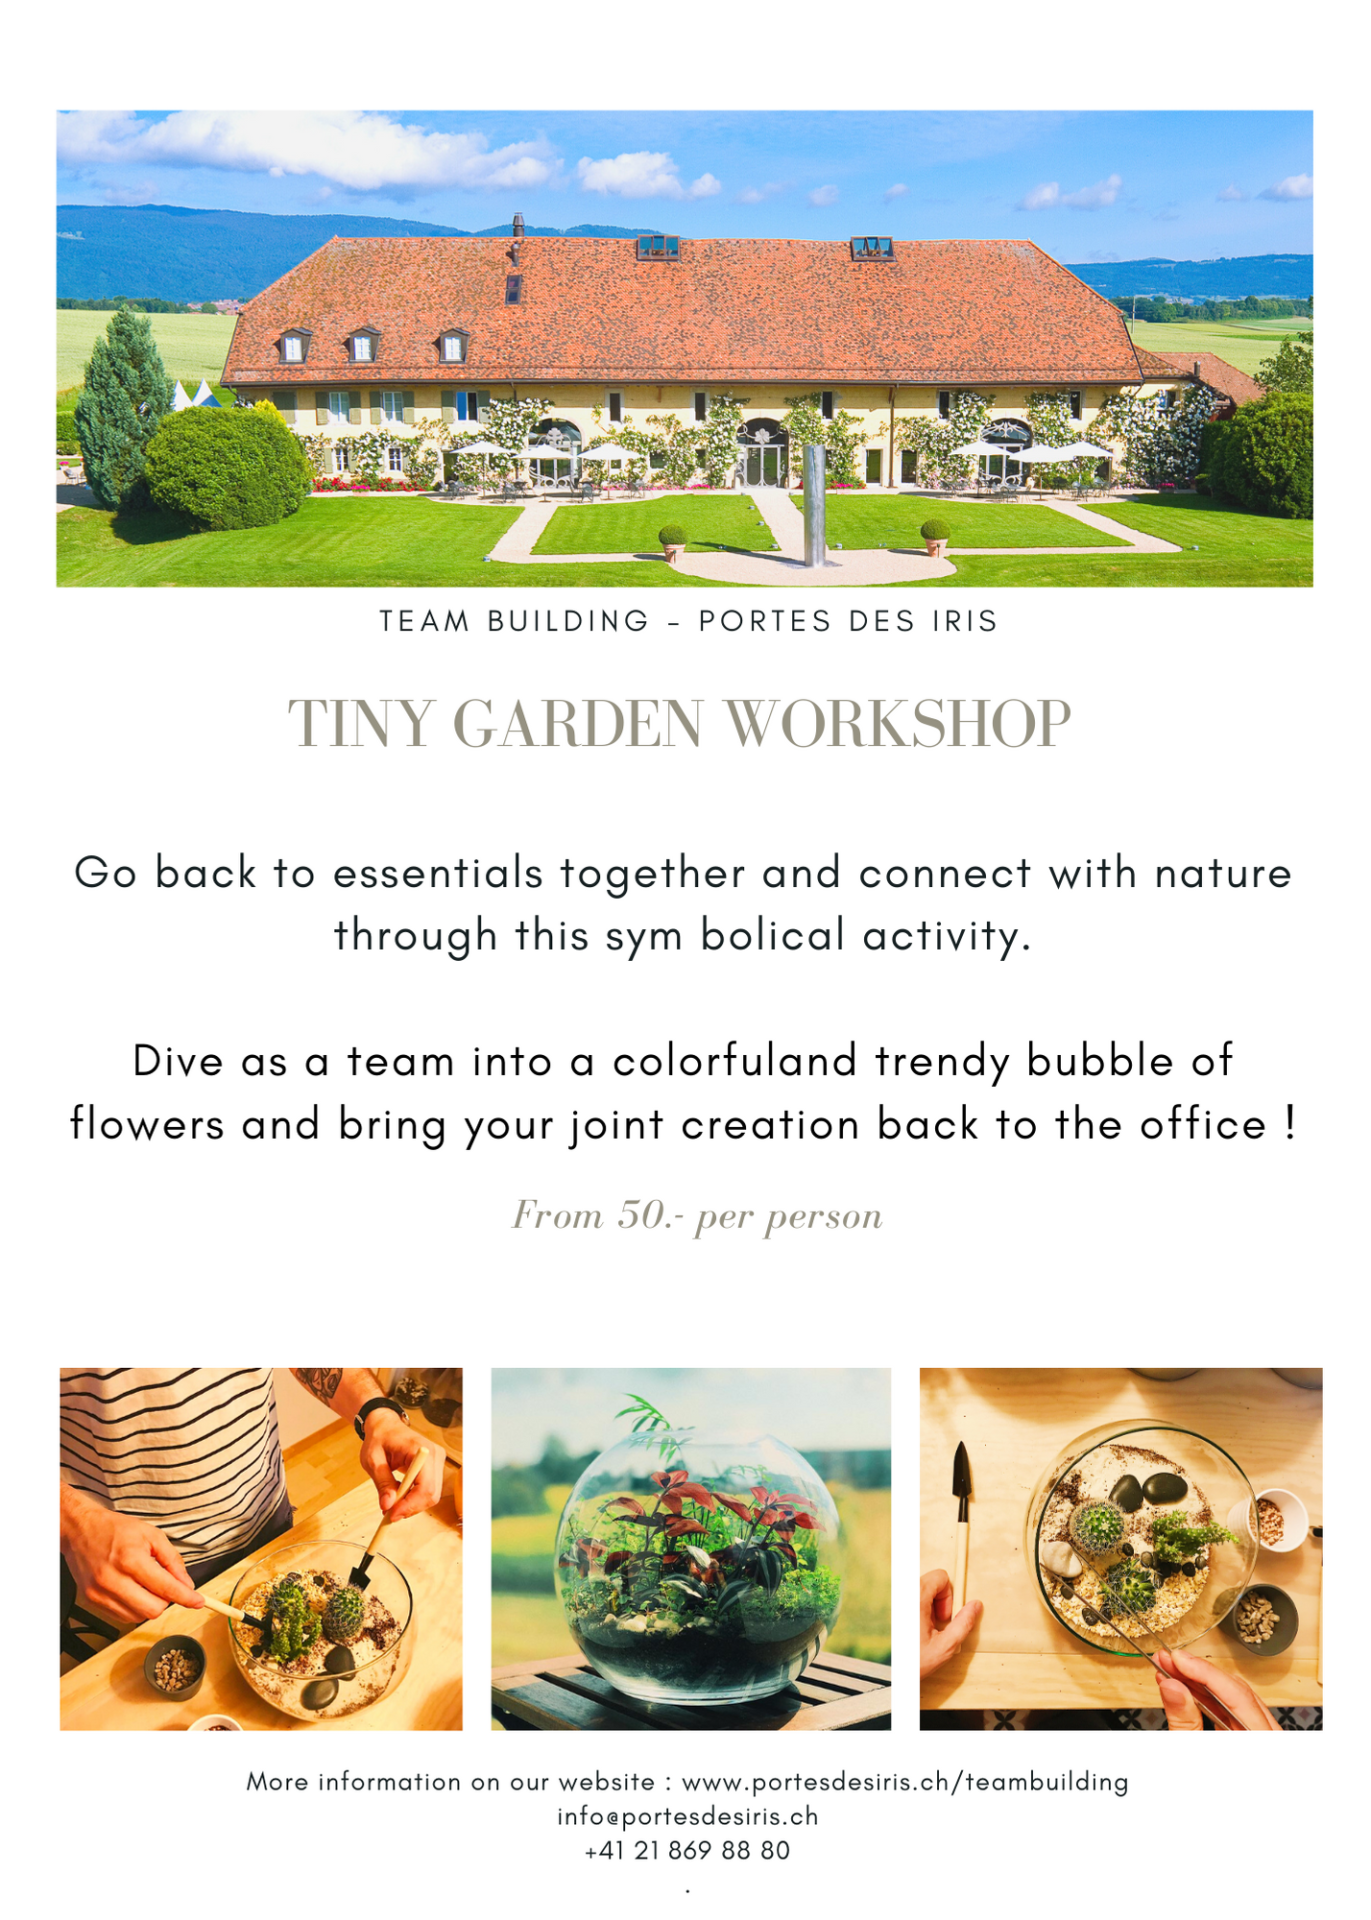 Tiny Garden EN - Teambuilding